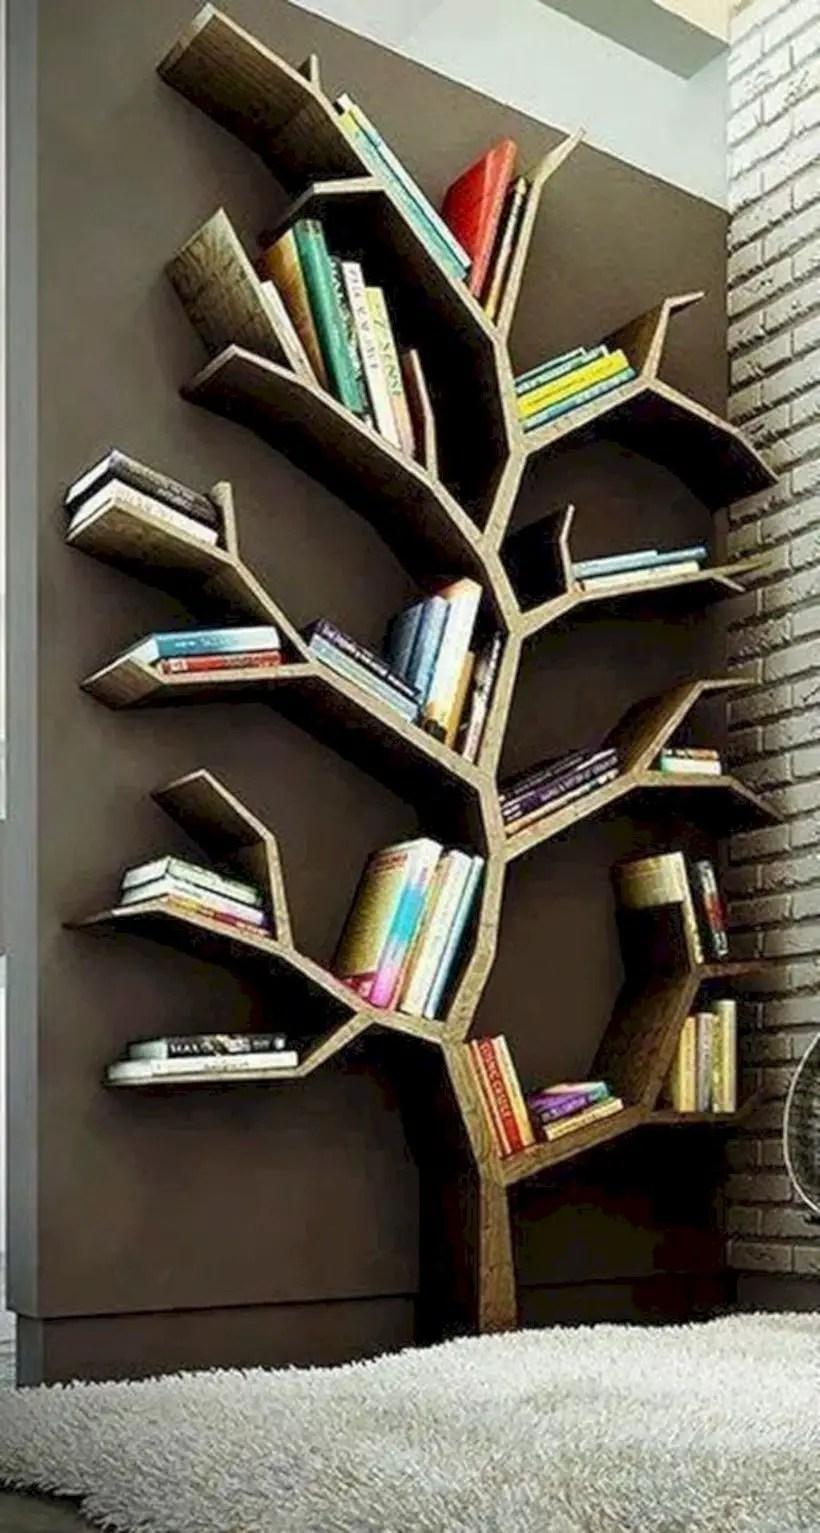 Unique storage solution for your book